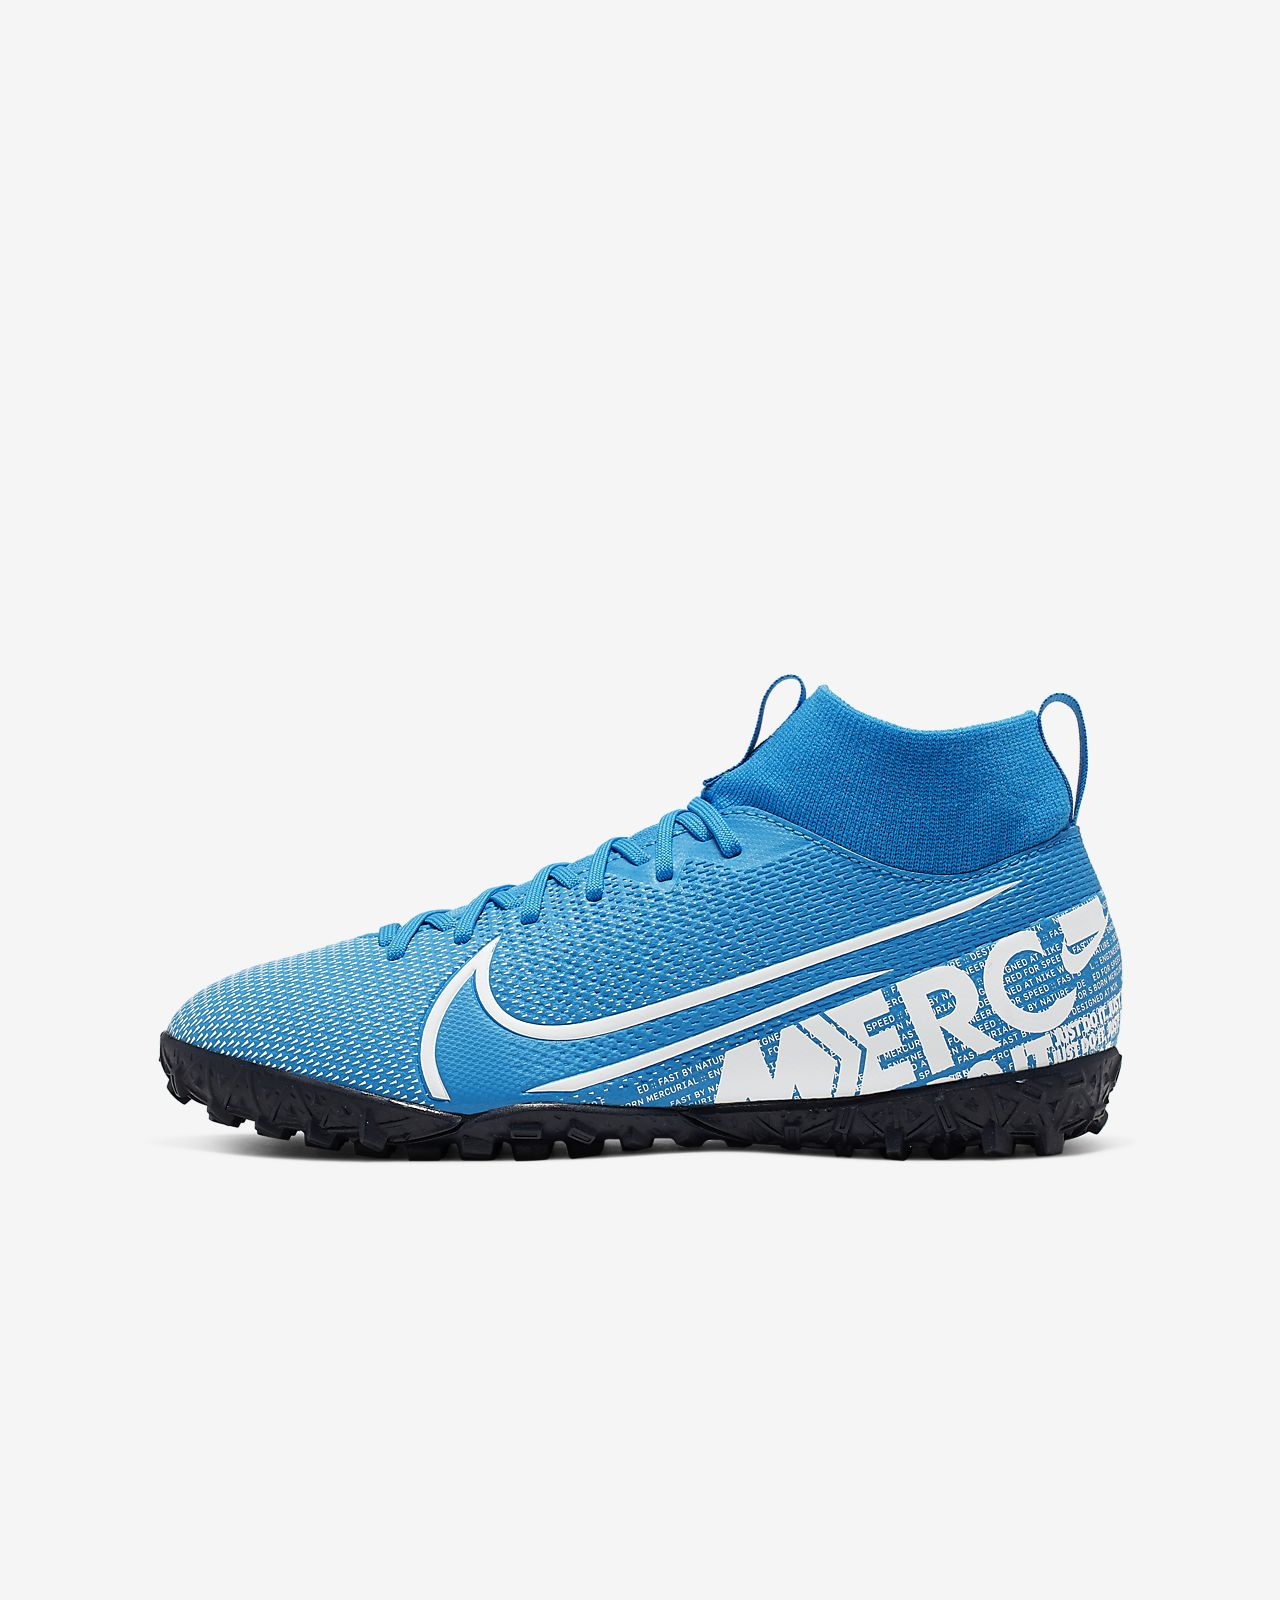 Nike Jr. Mercurial Superfly 7 Academy TF Botas de fútbol para hierba artificial o moqueta - Turf - Niño/a y niño/a pequeño/a